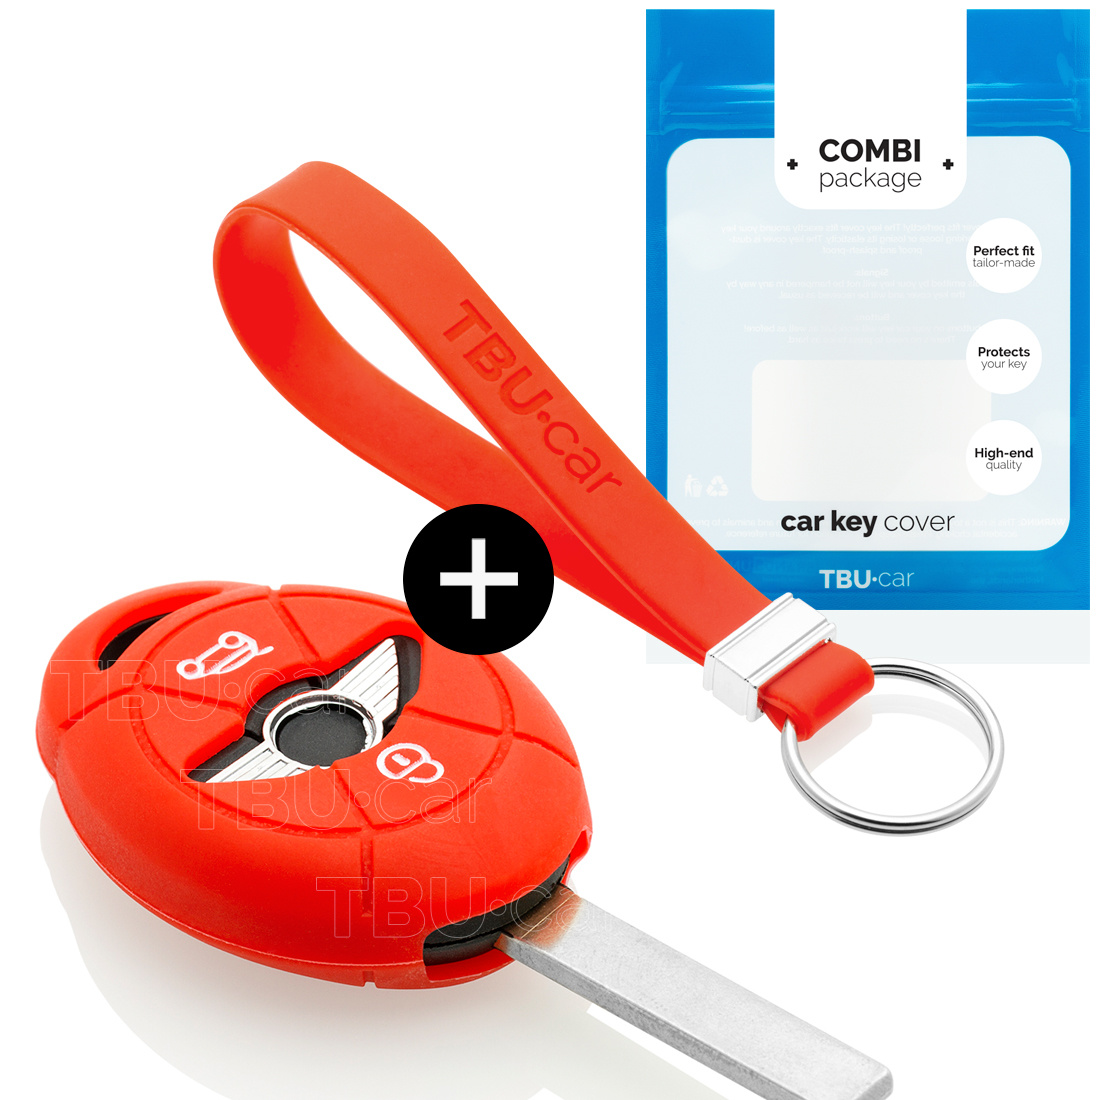 Mini Autoschlüssel Hülle - Silikon Schutzhülle - Schlüsselhülle Cover - Rot